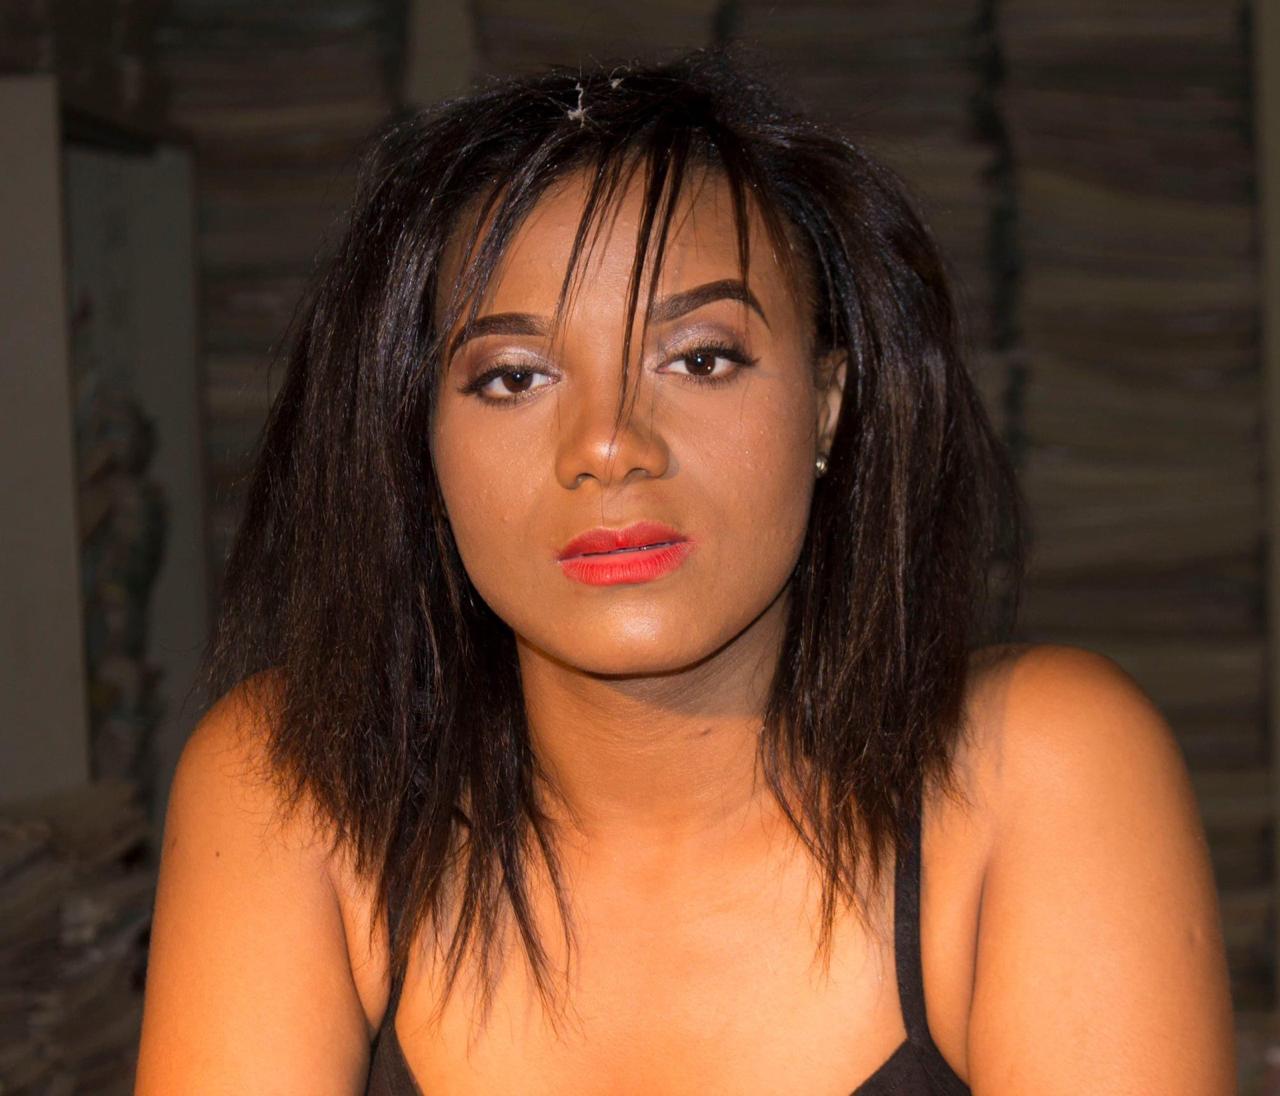 Teatro online com Horizonte Njinga Mbande